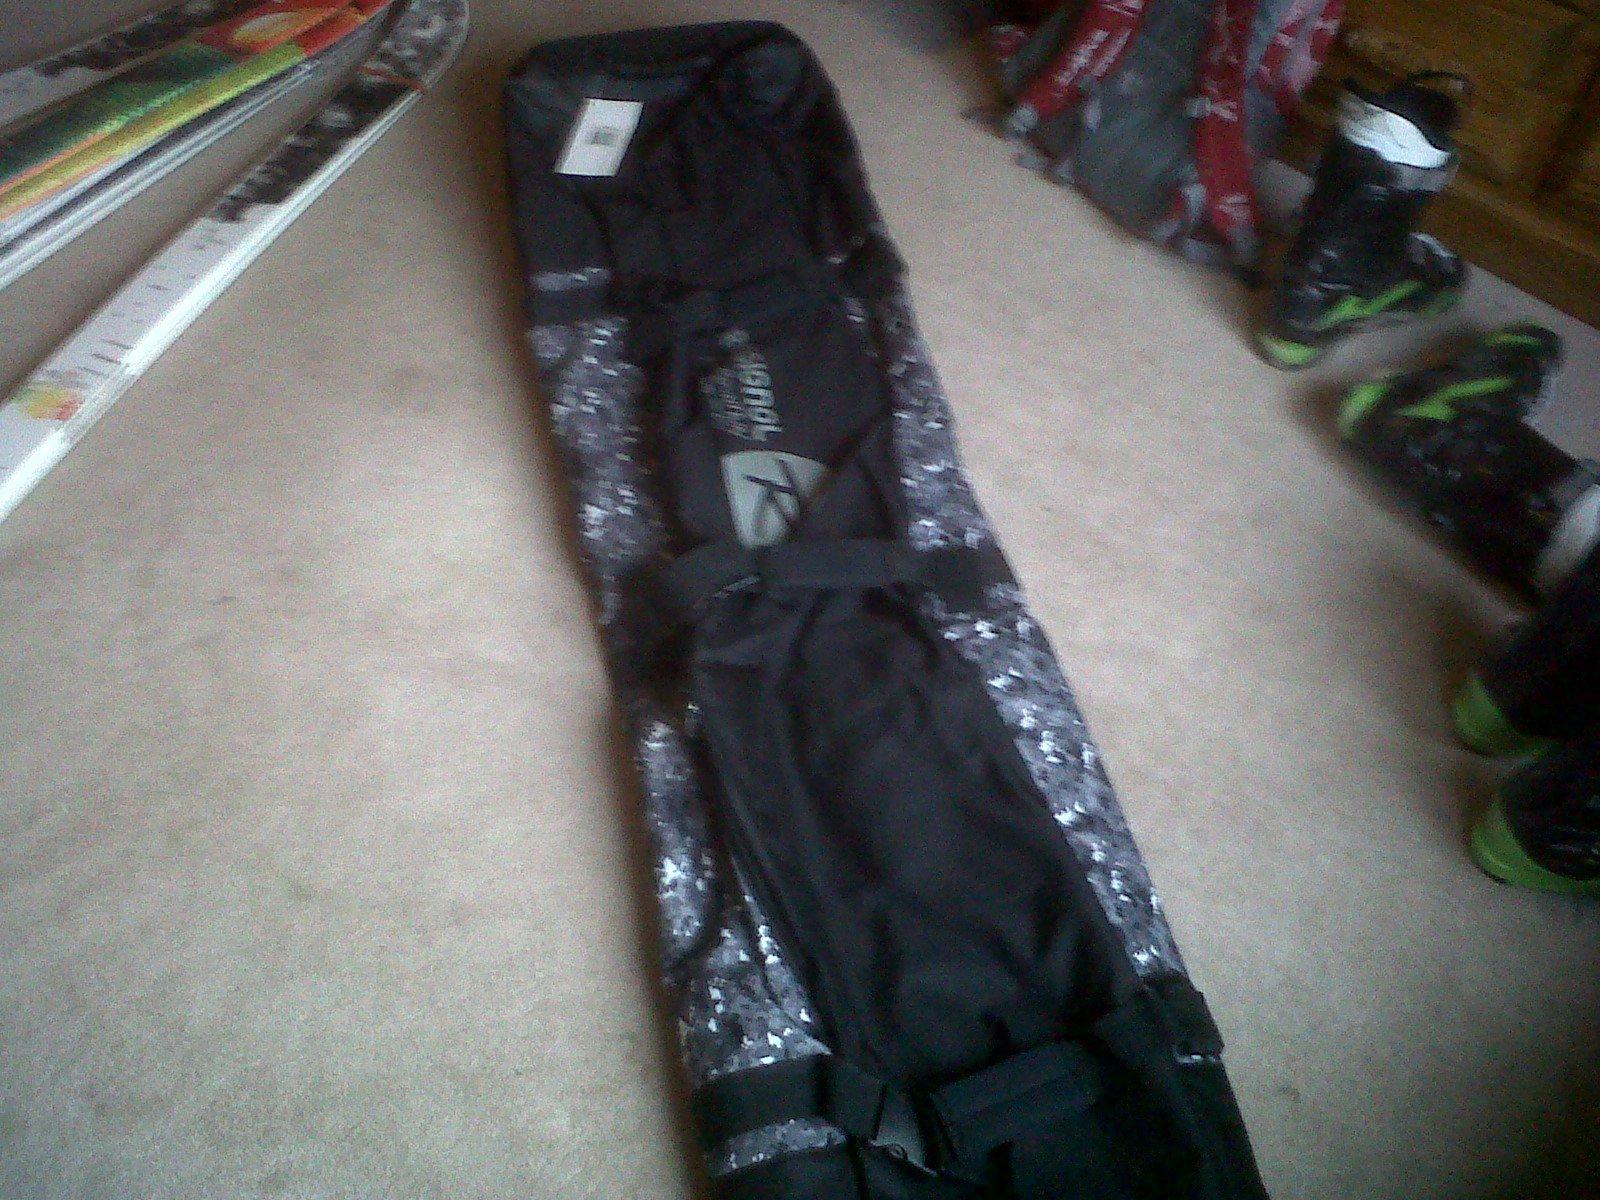 Rossingol ski bag for sale, check thread